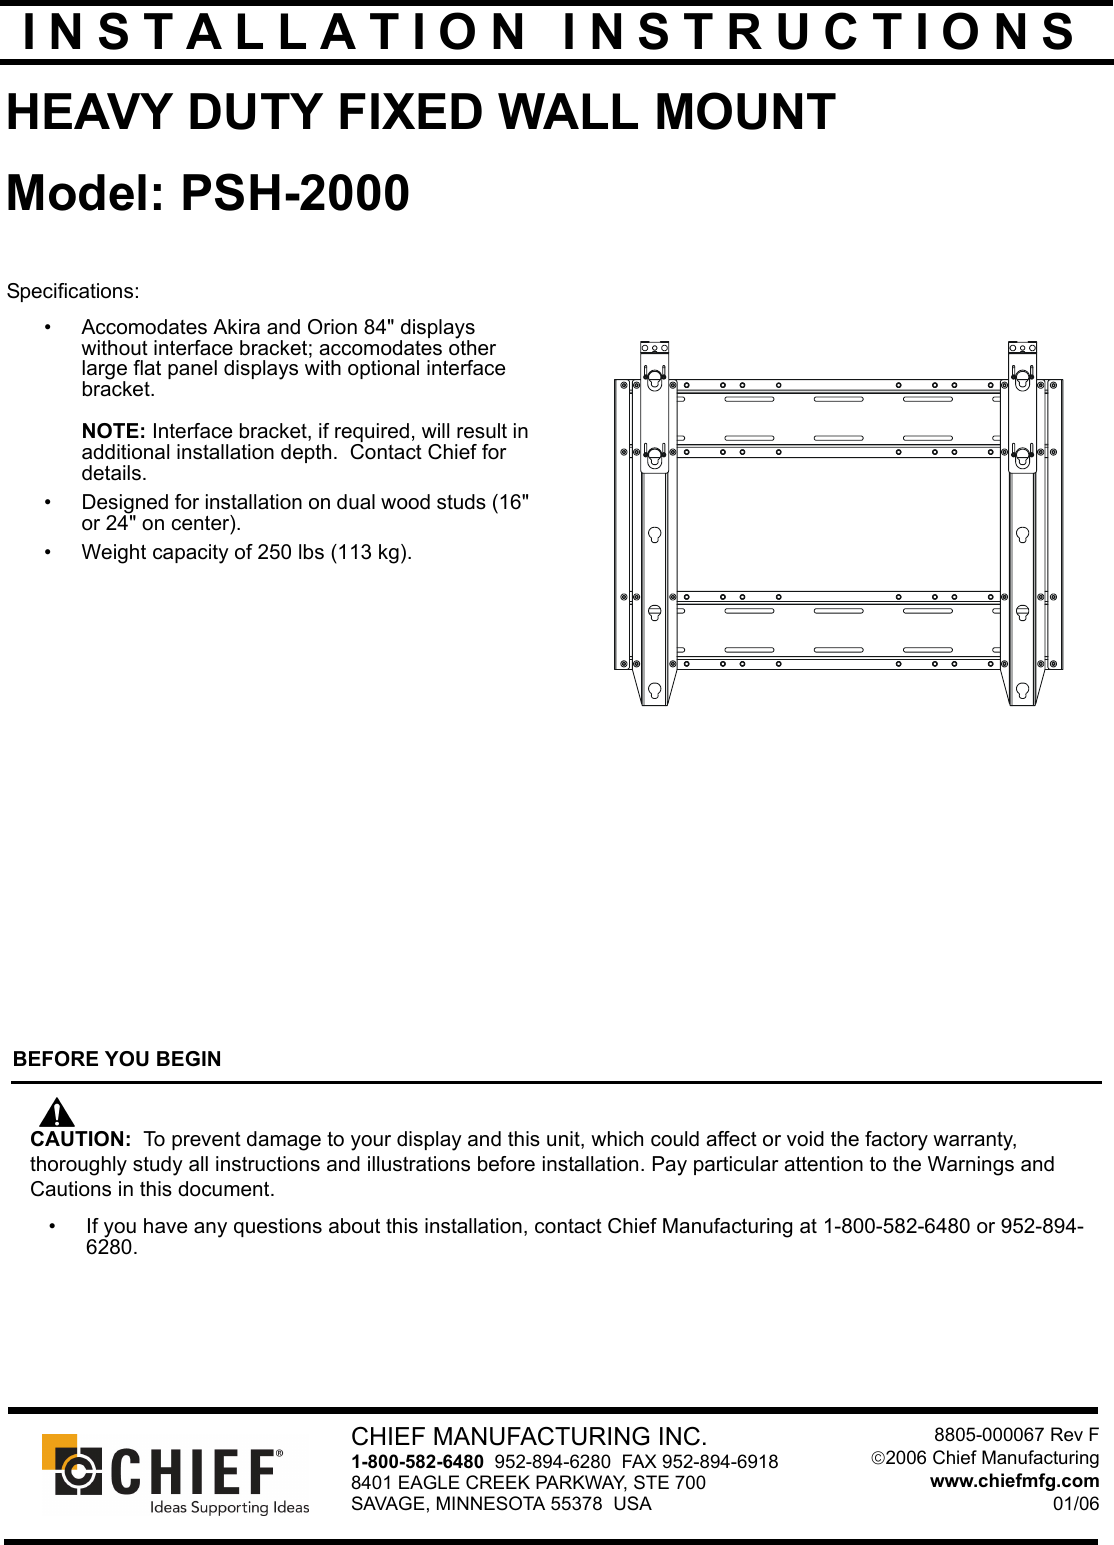 chief manufacturing psh 2000 users manual psh2000 installation rh usermanual wiki New Plane Manufacturing Manufacturing Manual Labor